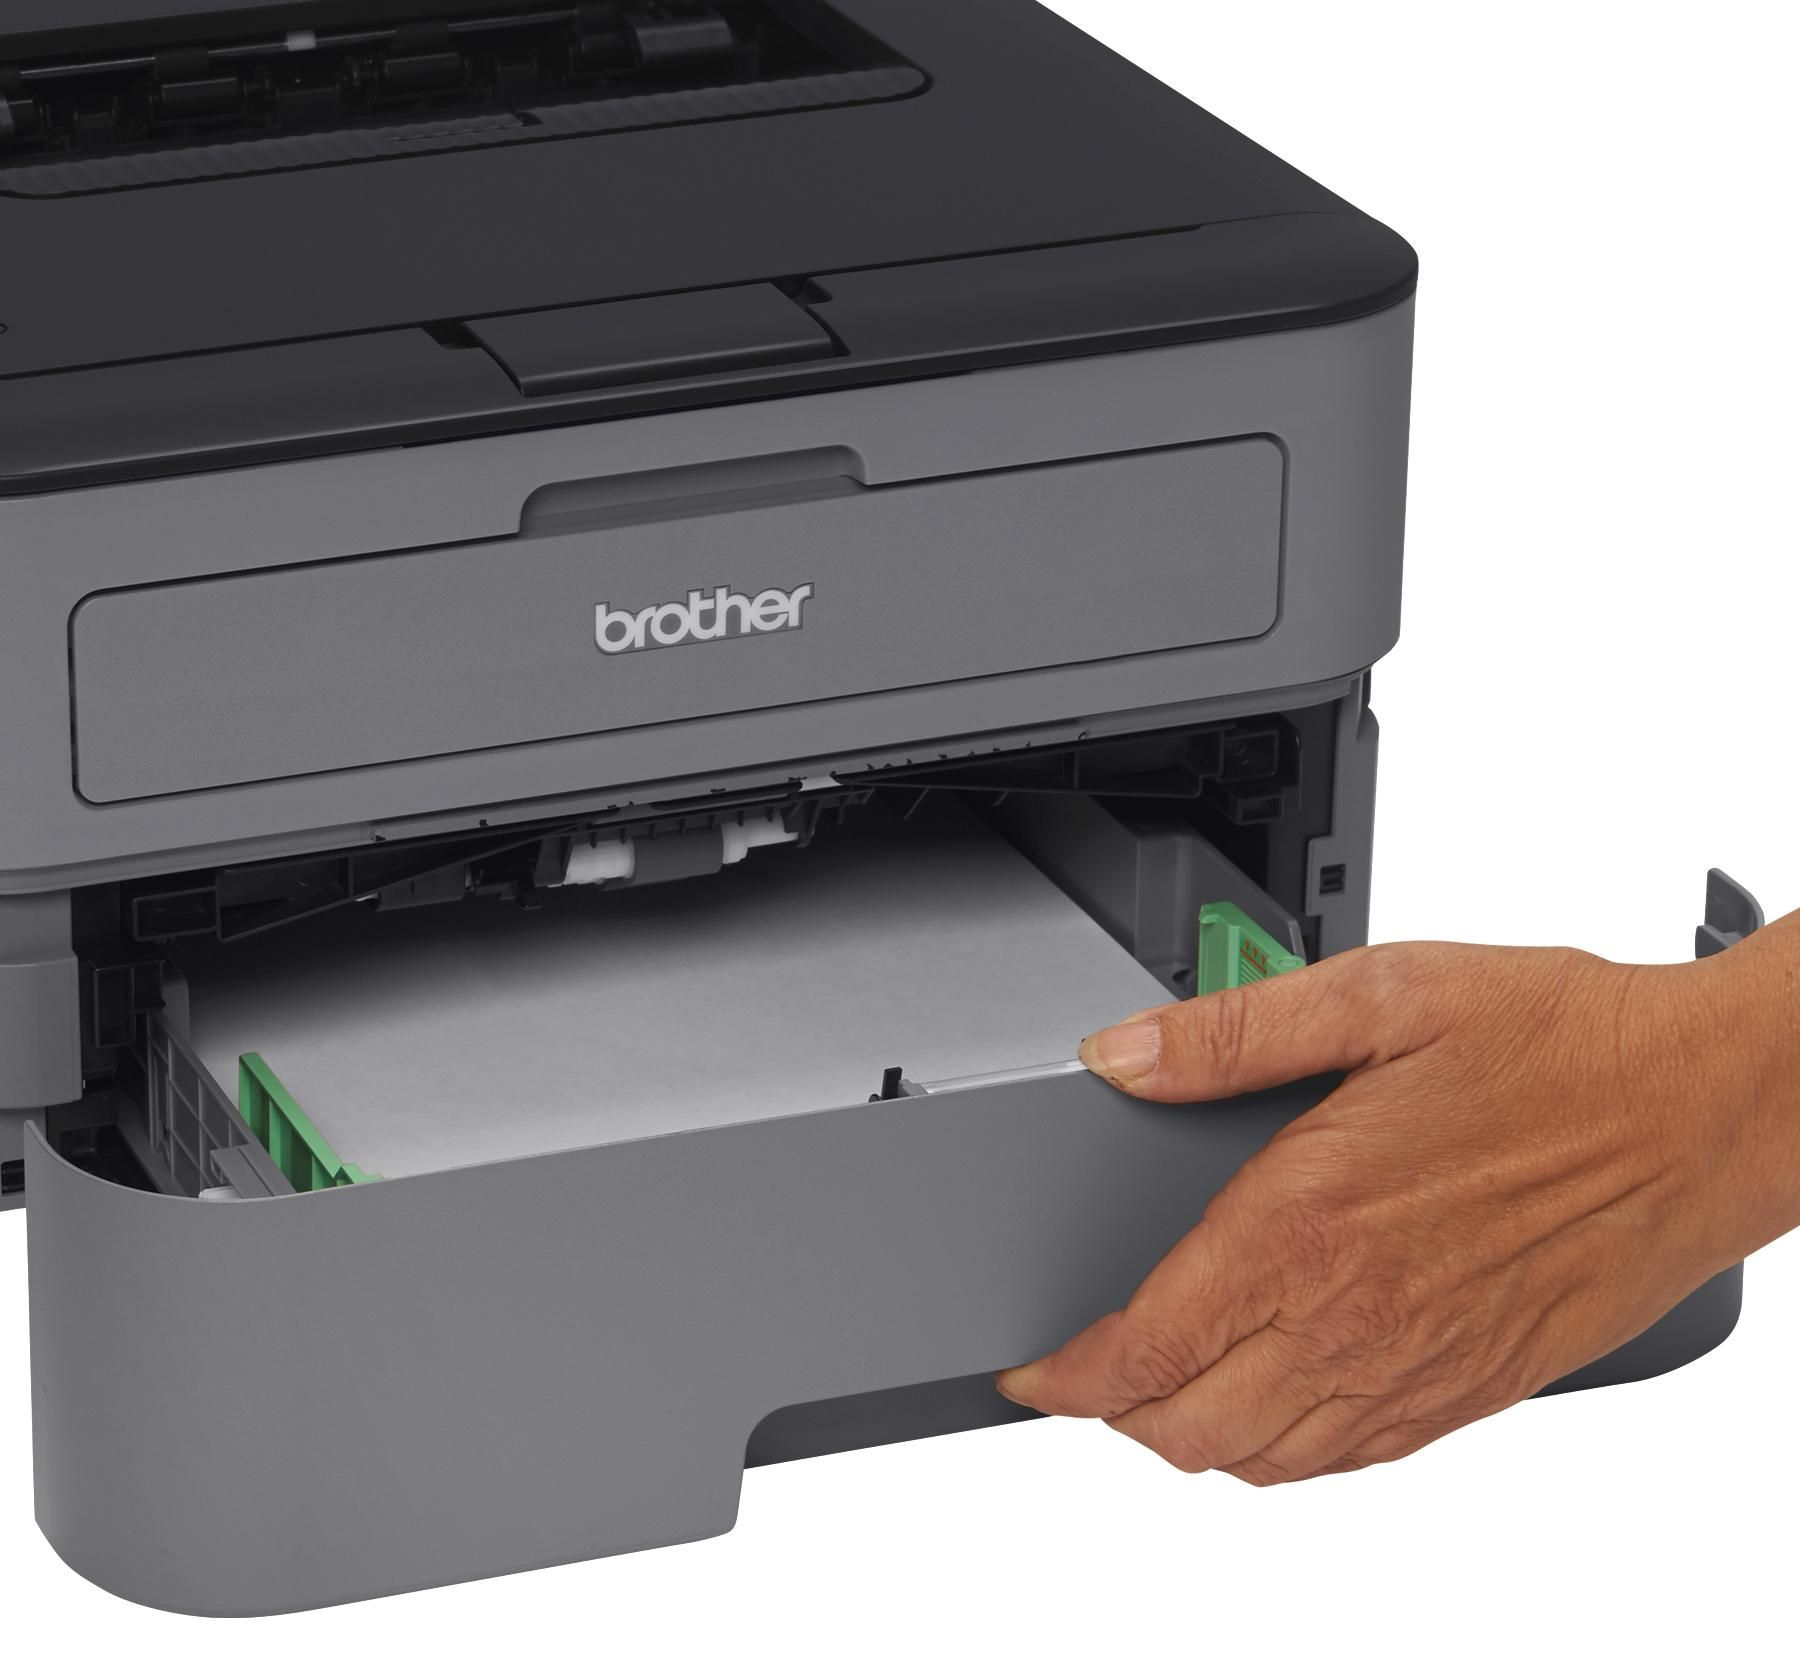 78 Amazon Com Brother Hl L2300d Monochrome Laser Printer With Duplex Printing Electronics Laser Printer Printer Paper Handling